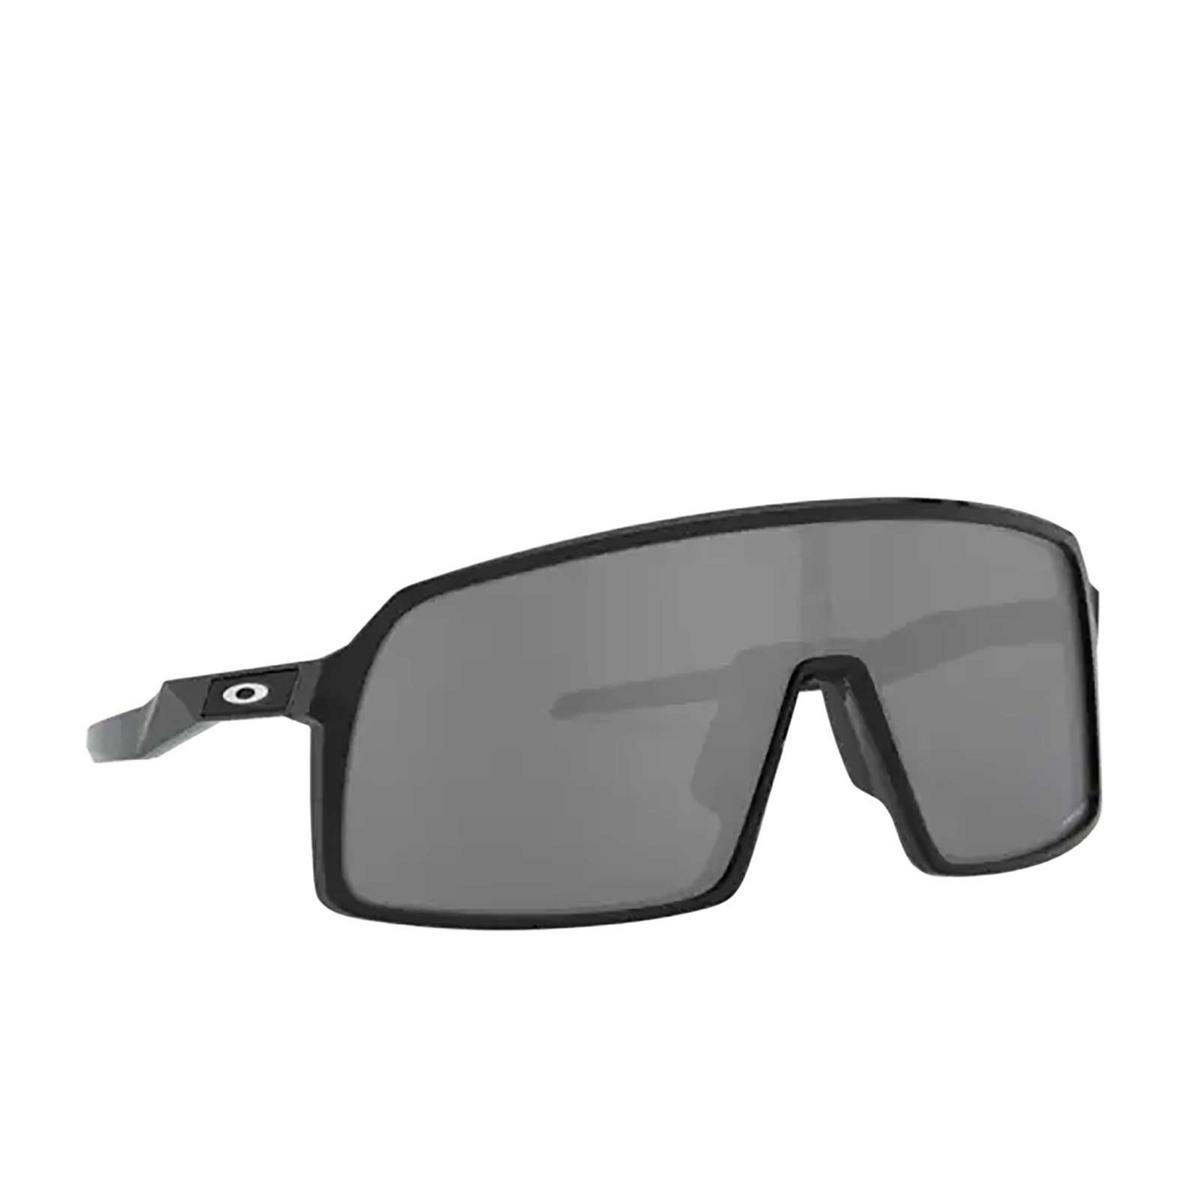 Oakley® Sport Sunglasses: Sutro OO9406 color Polished Black 940601 - three-quarters view.